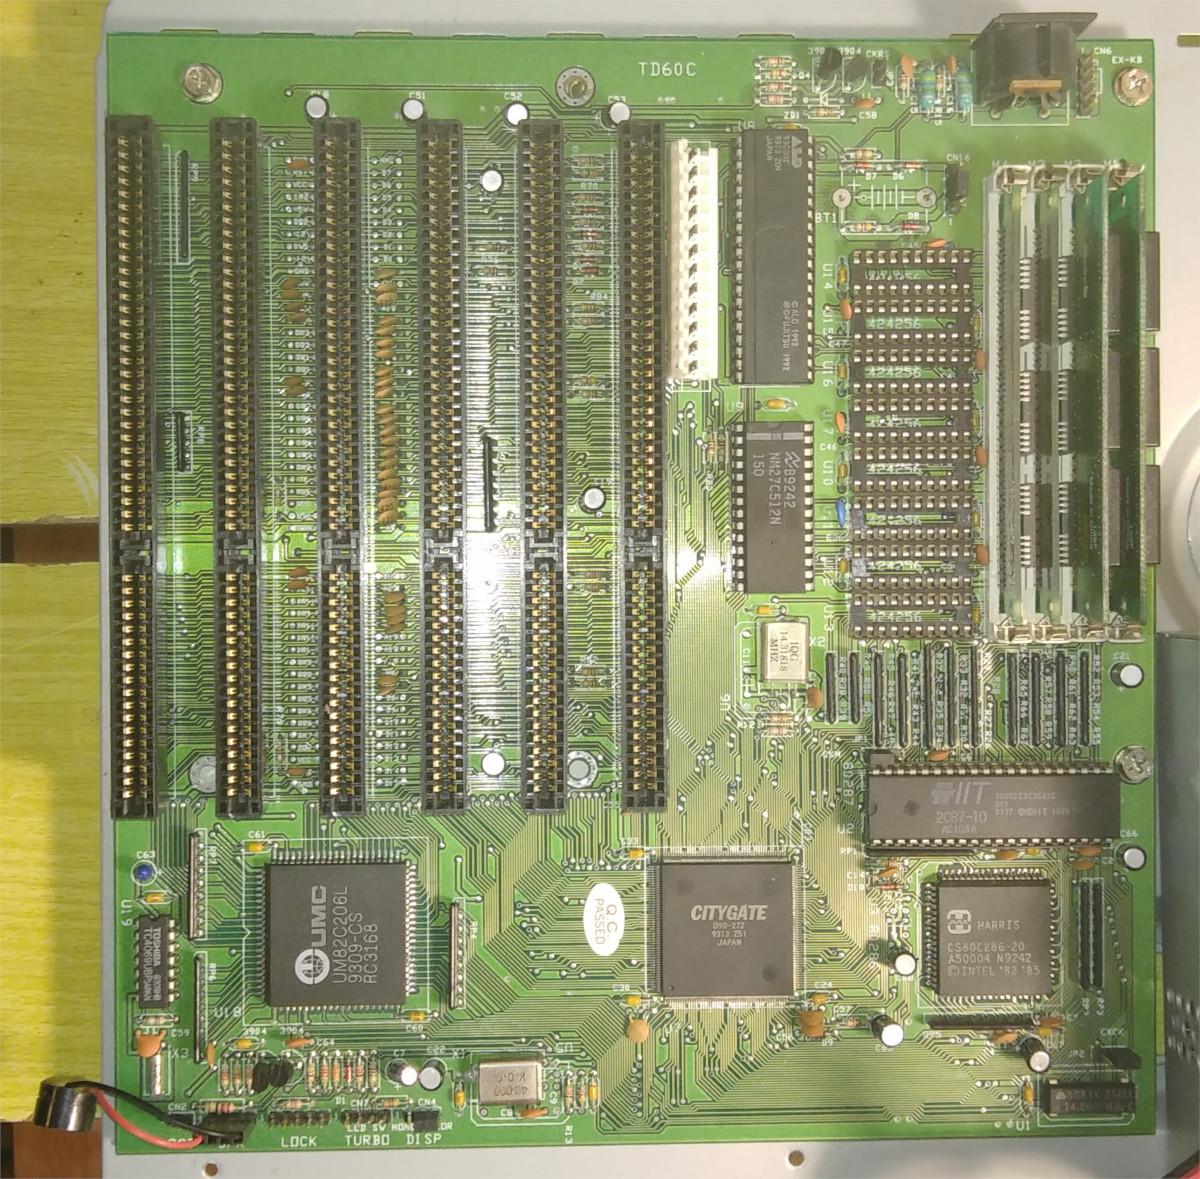 Сборка PC AT-совместимого компьютера с процессором 80286